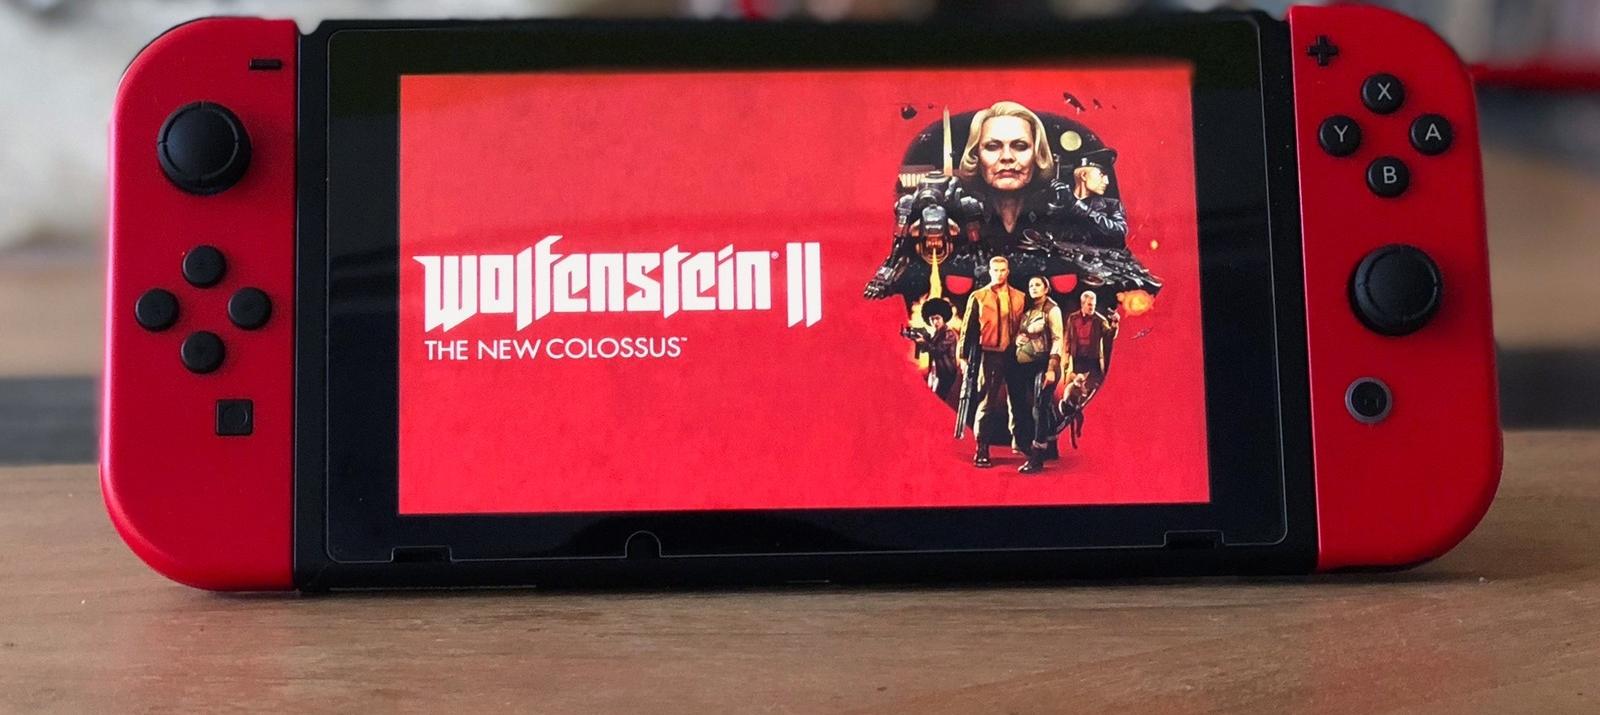 Революция в кармане: обзор Wolfenstein II для Nintendo Switch